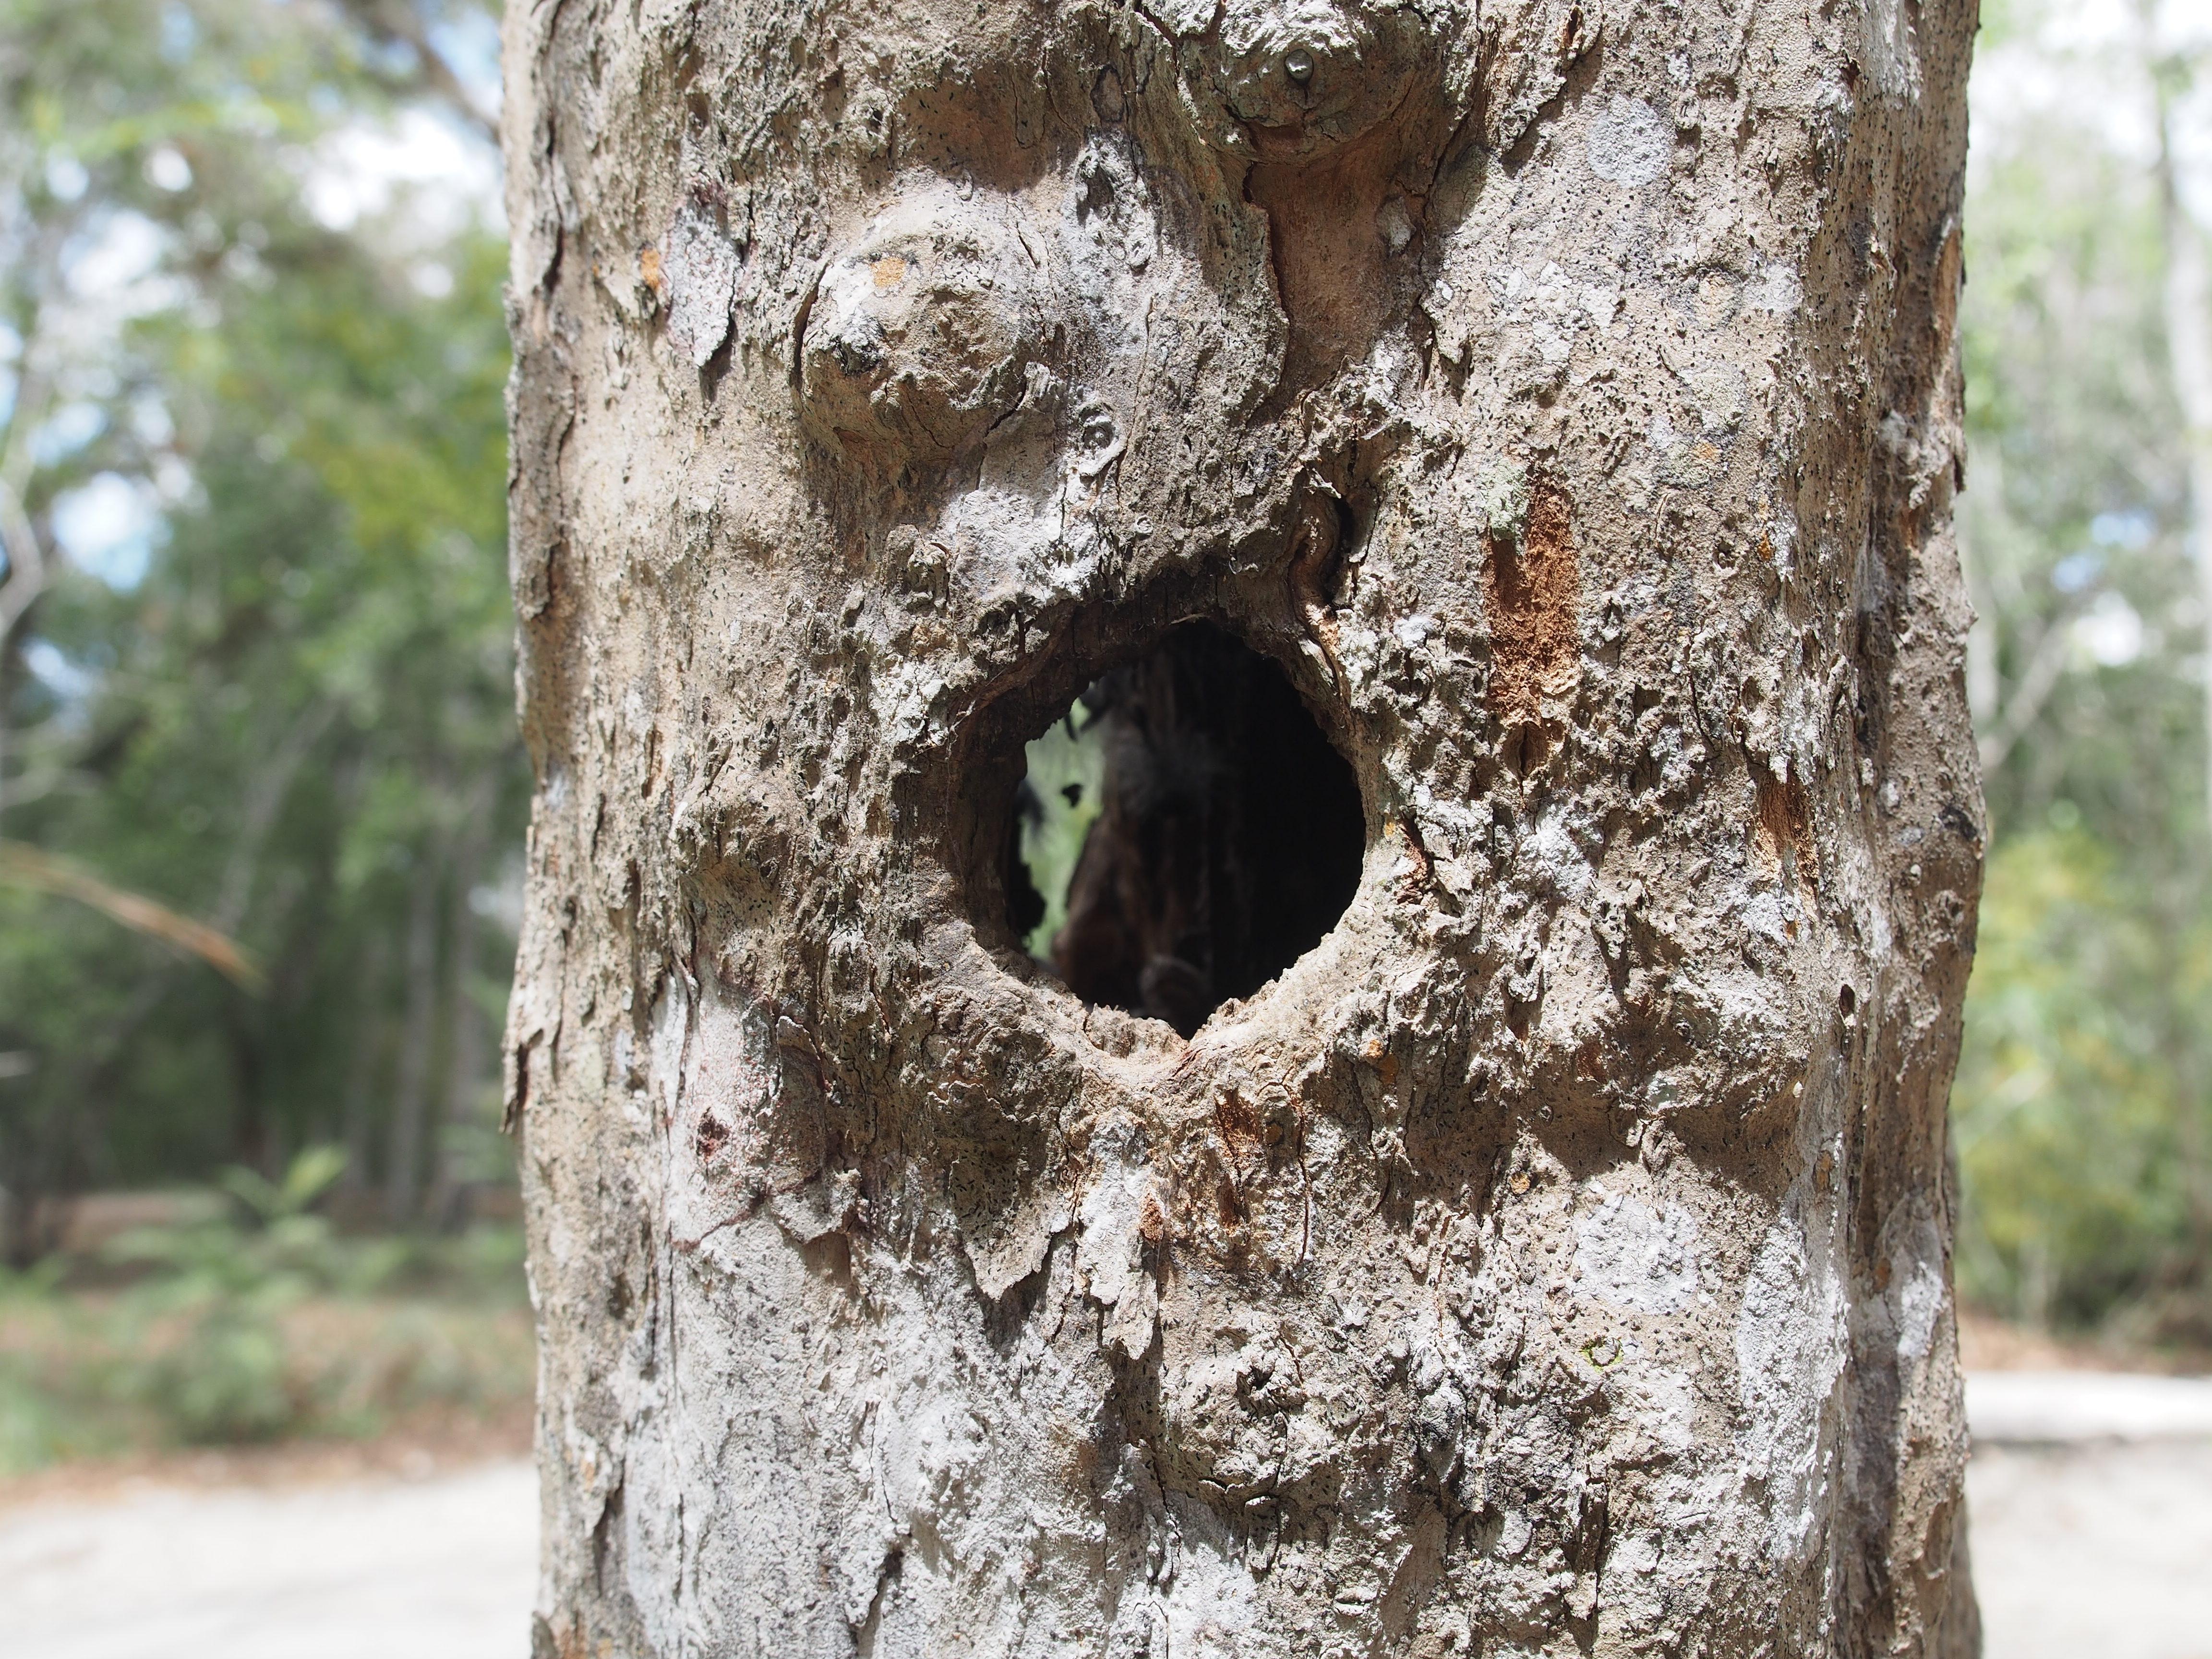 woodpecker calakmul mexico